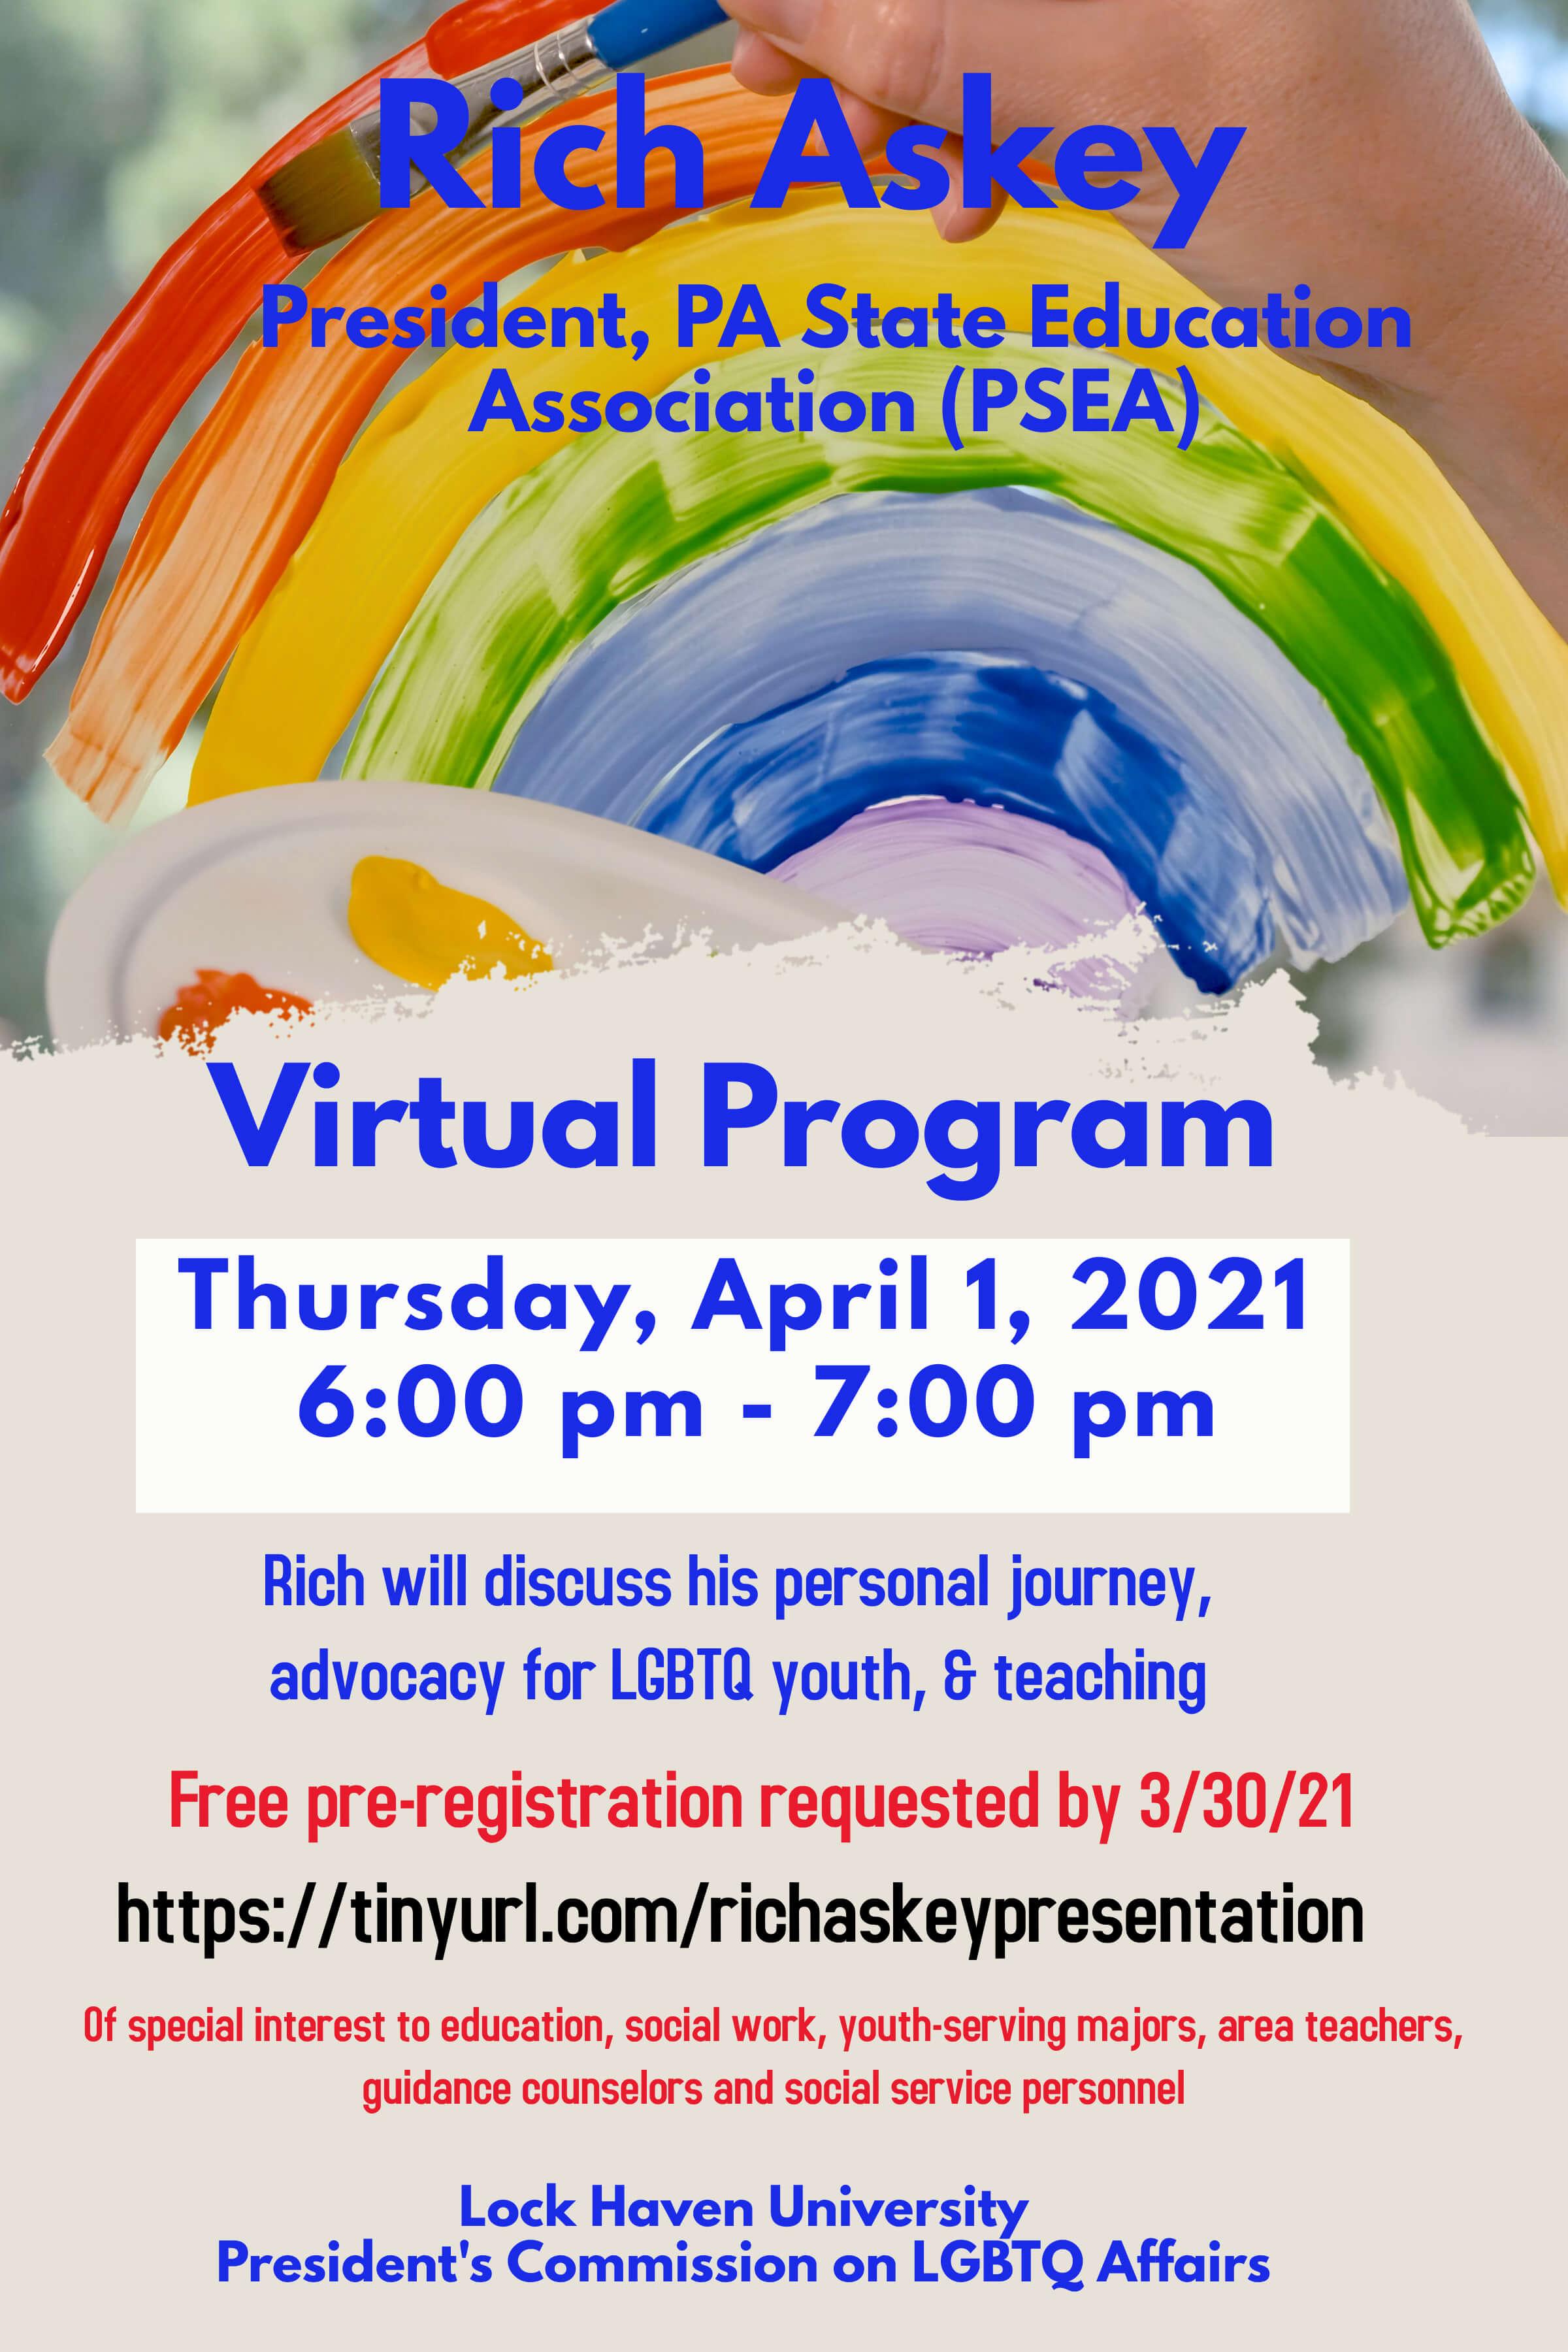 Rich Askey Event flyer